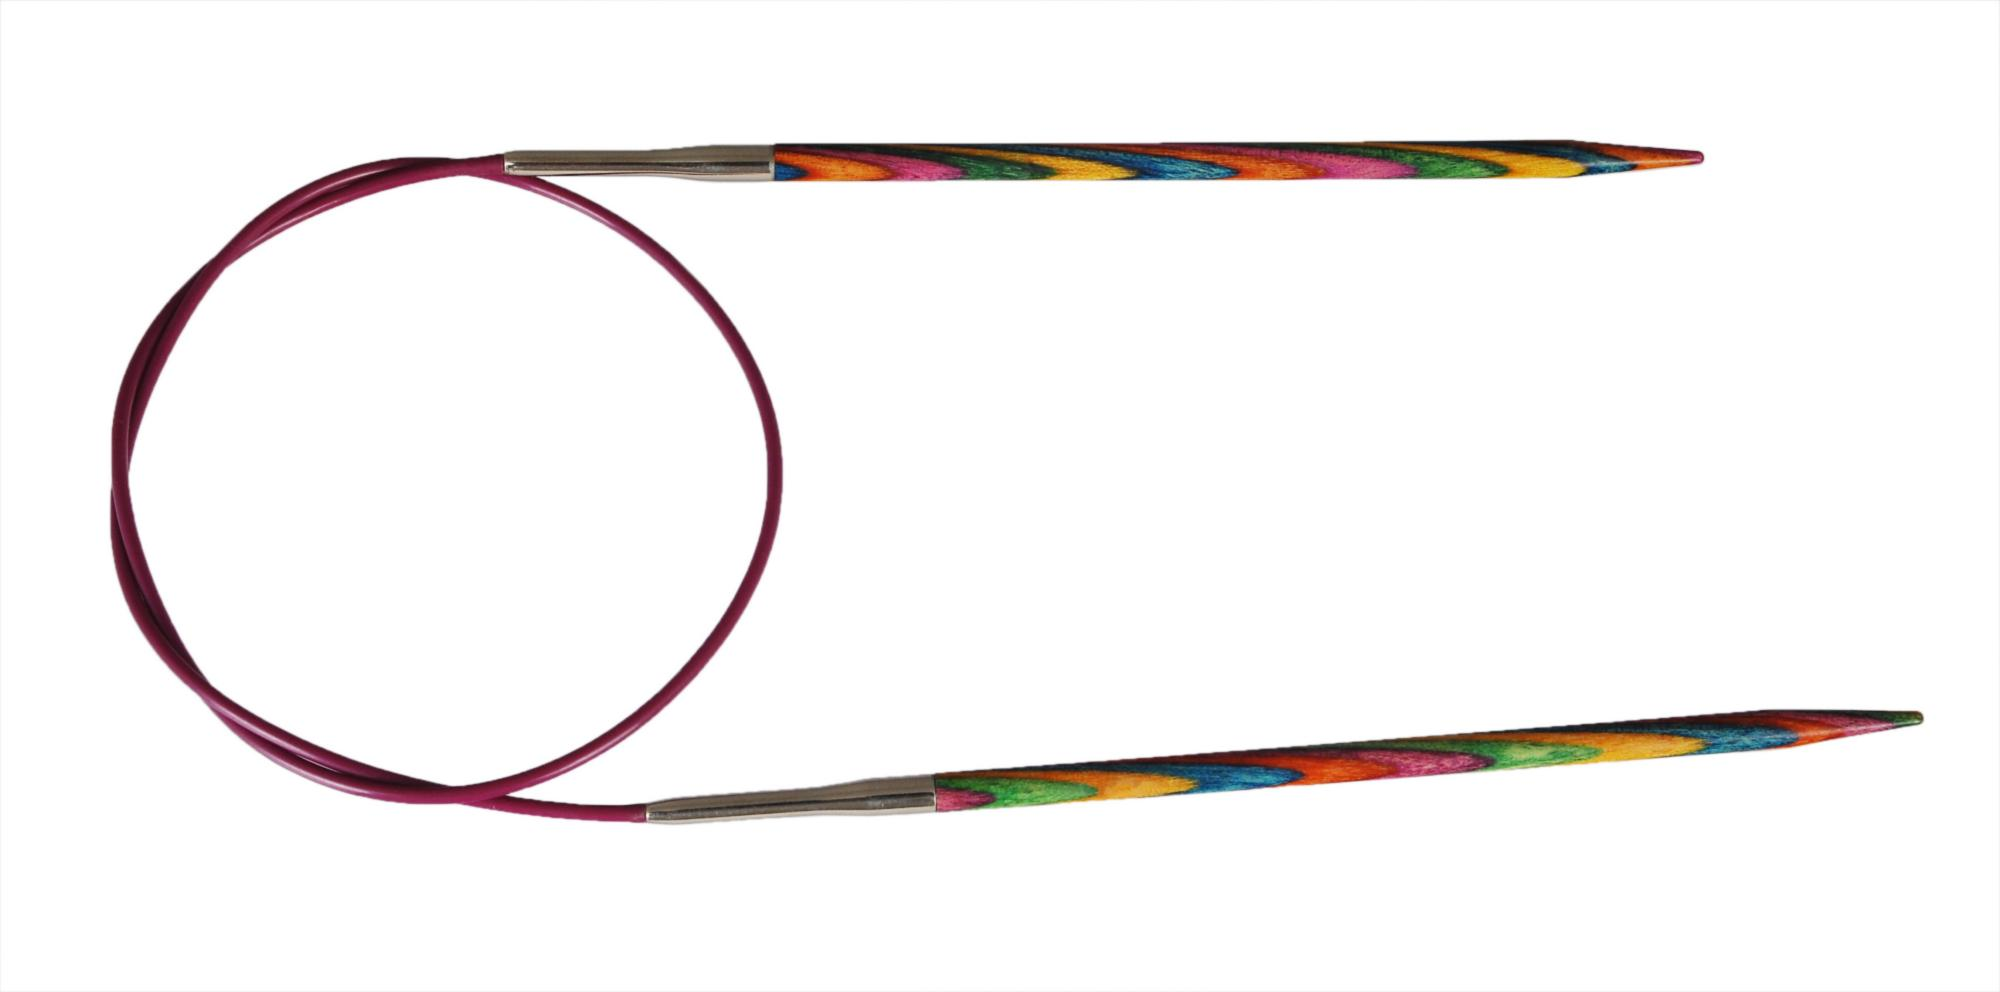 Спицы круговые 80 см Symfonie Wood KnitPro, 21335, 3.50 мм